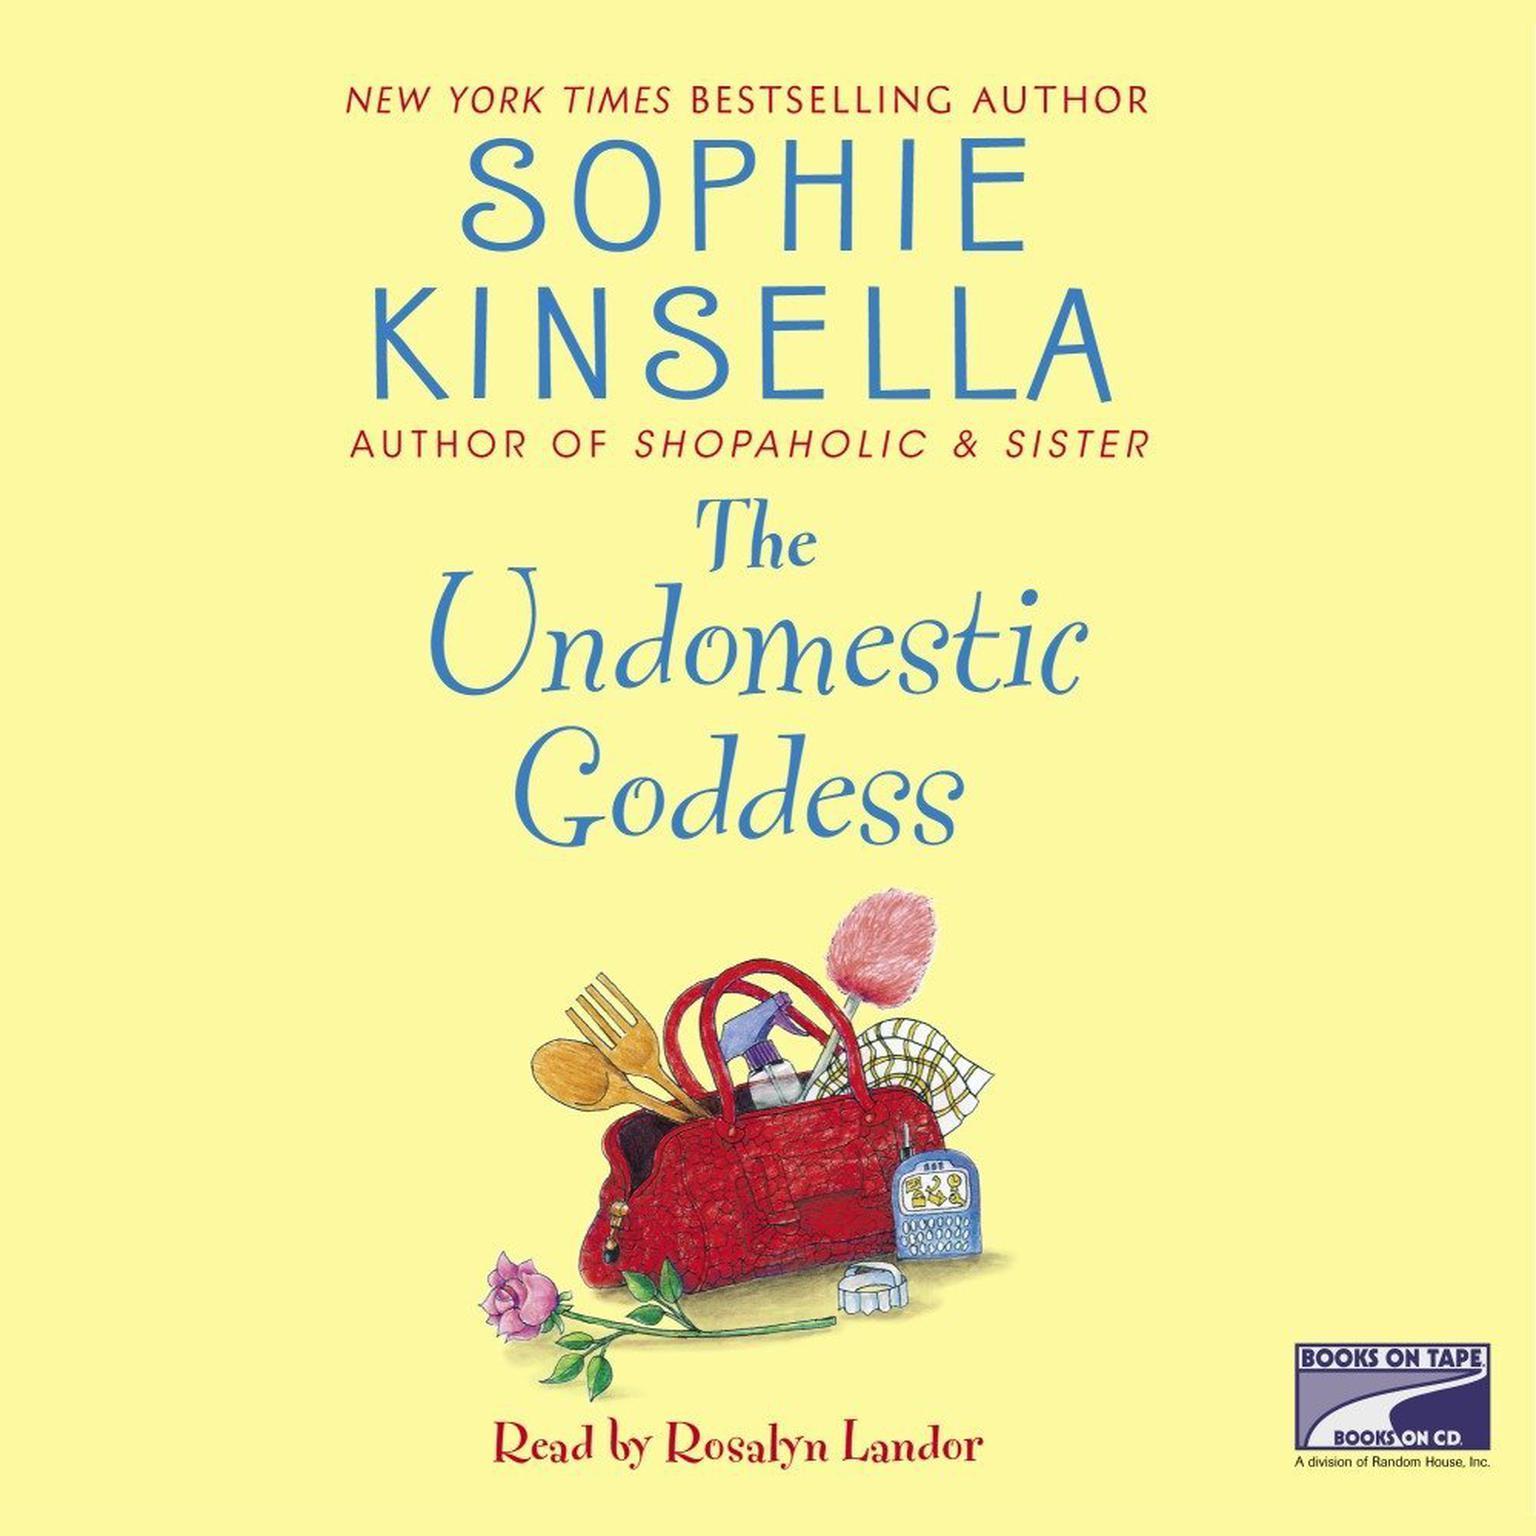 Sophie Kinsella Audiobook Torrent Free Download